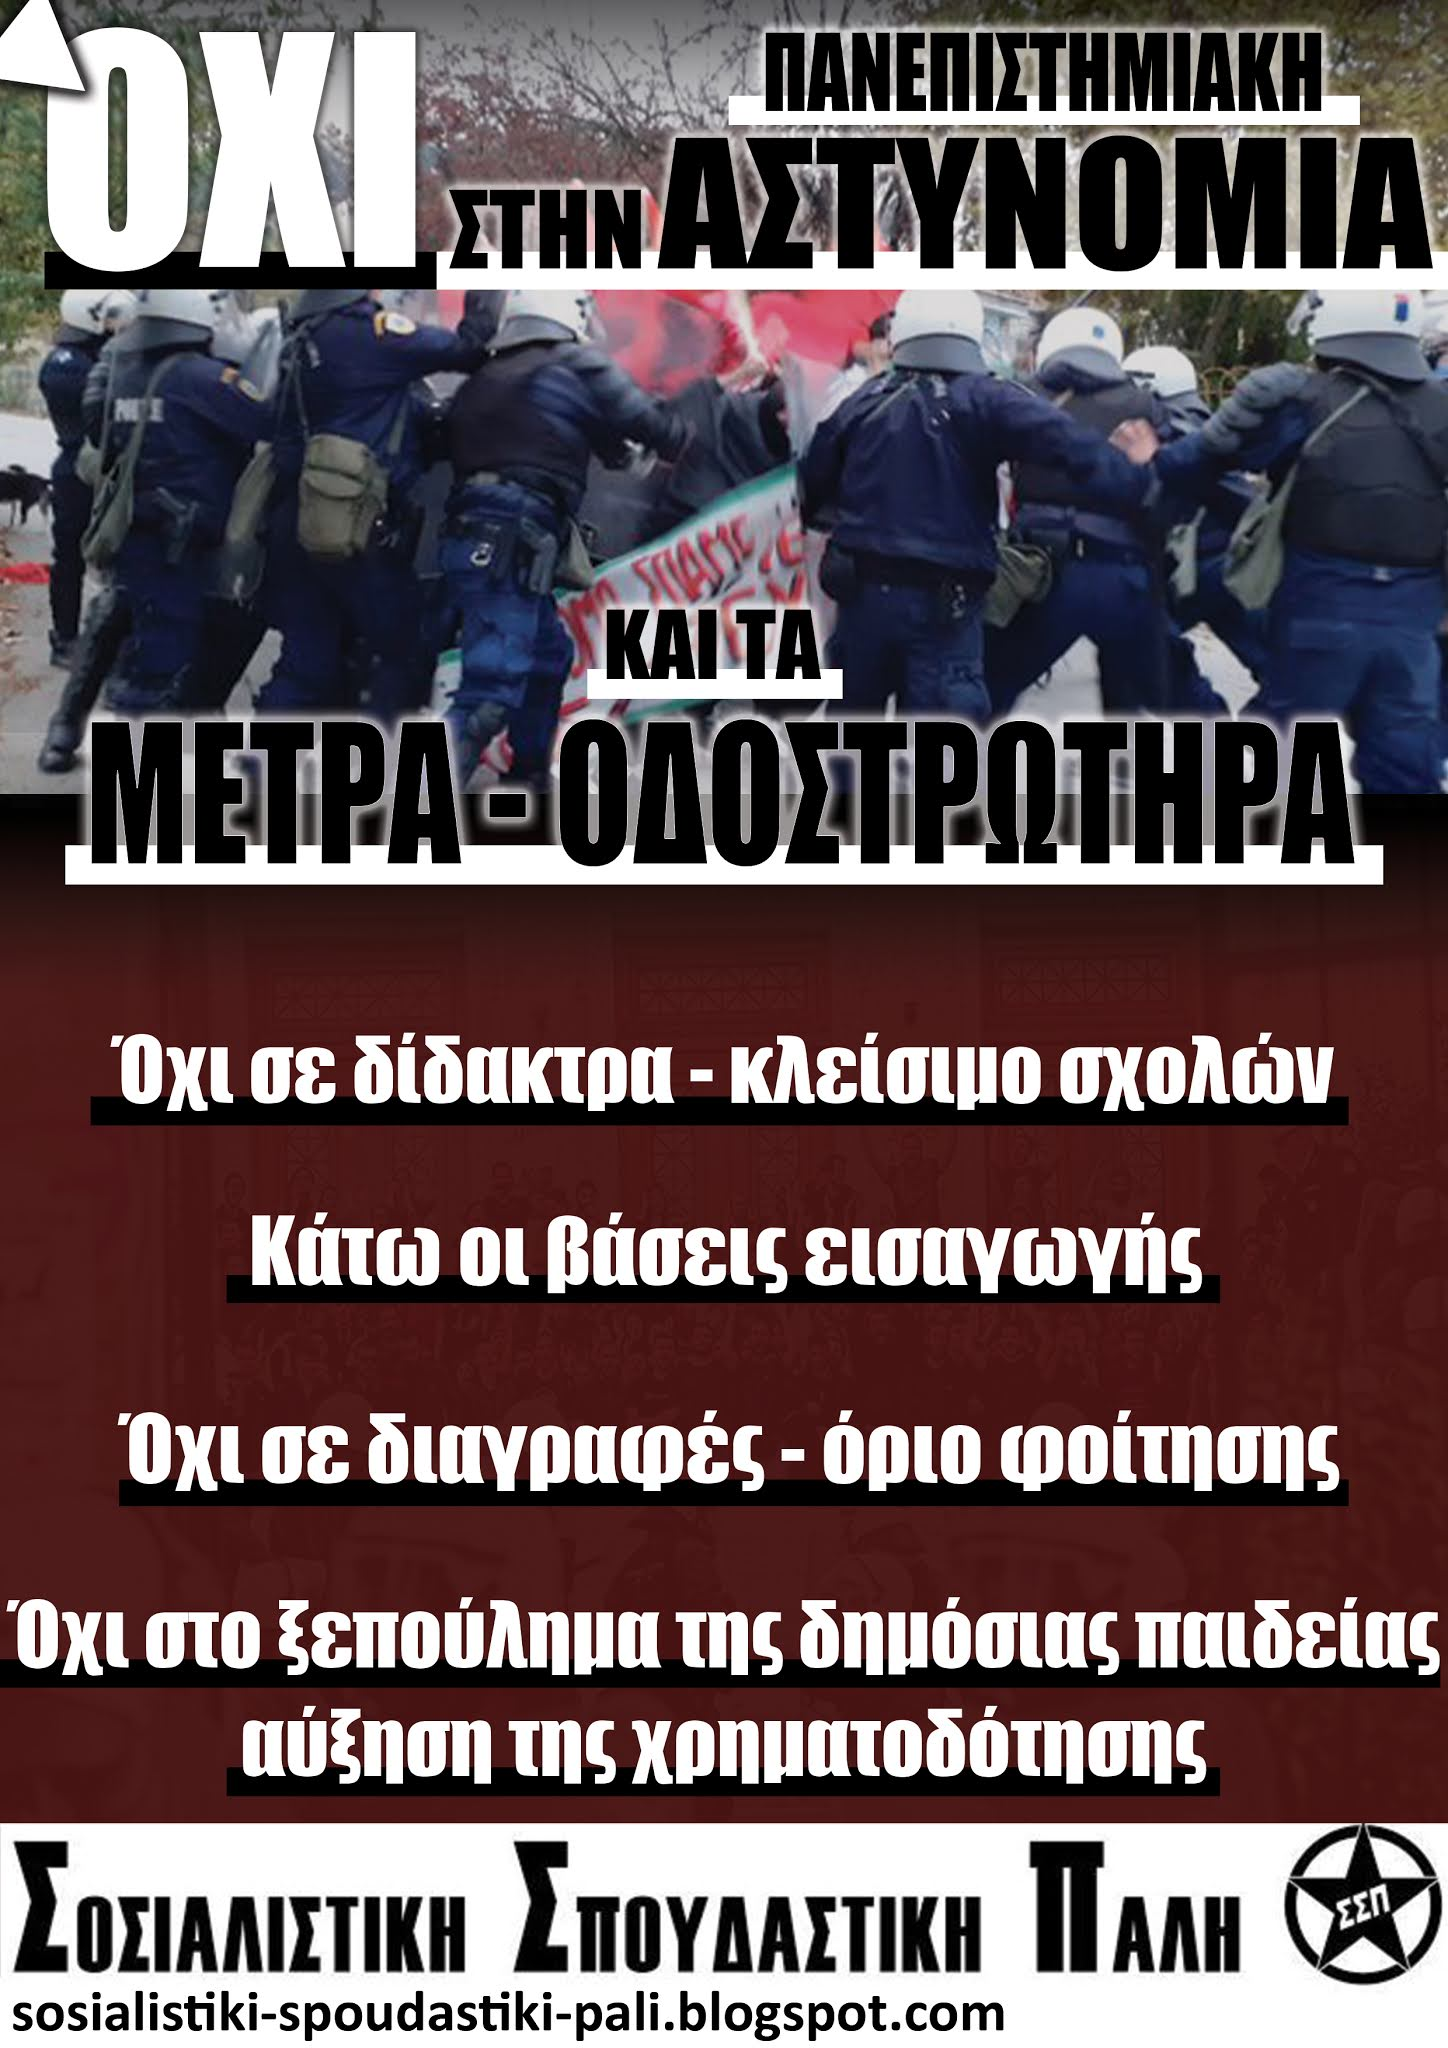 Video: Όχι στην ίδρυση της πανεπιστημιακής αστυνομίας!